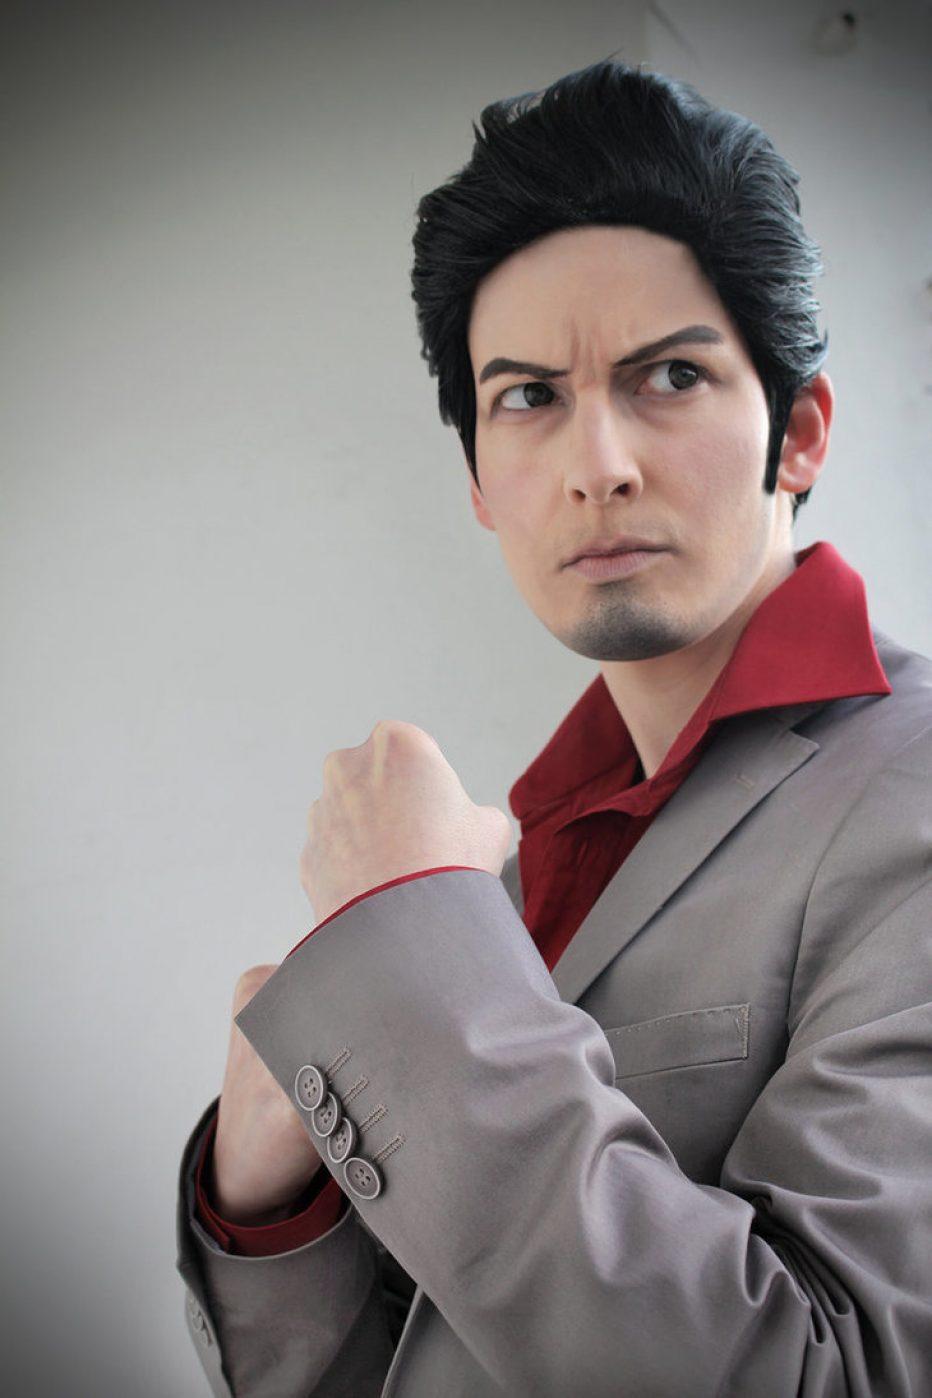 Kazuma-Kiryu-Yakuza-Cosplay-Gamers-Heroes-5.jpg